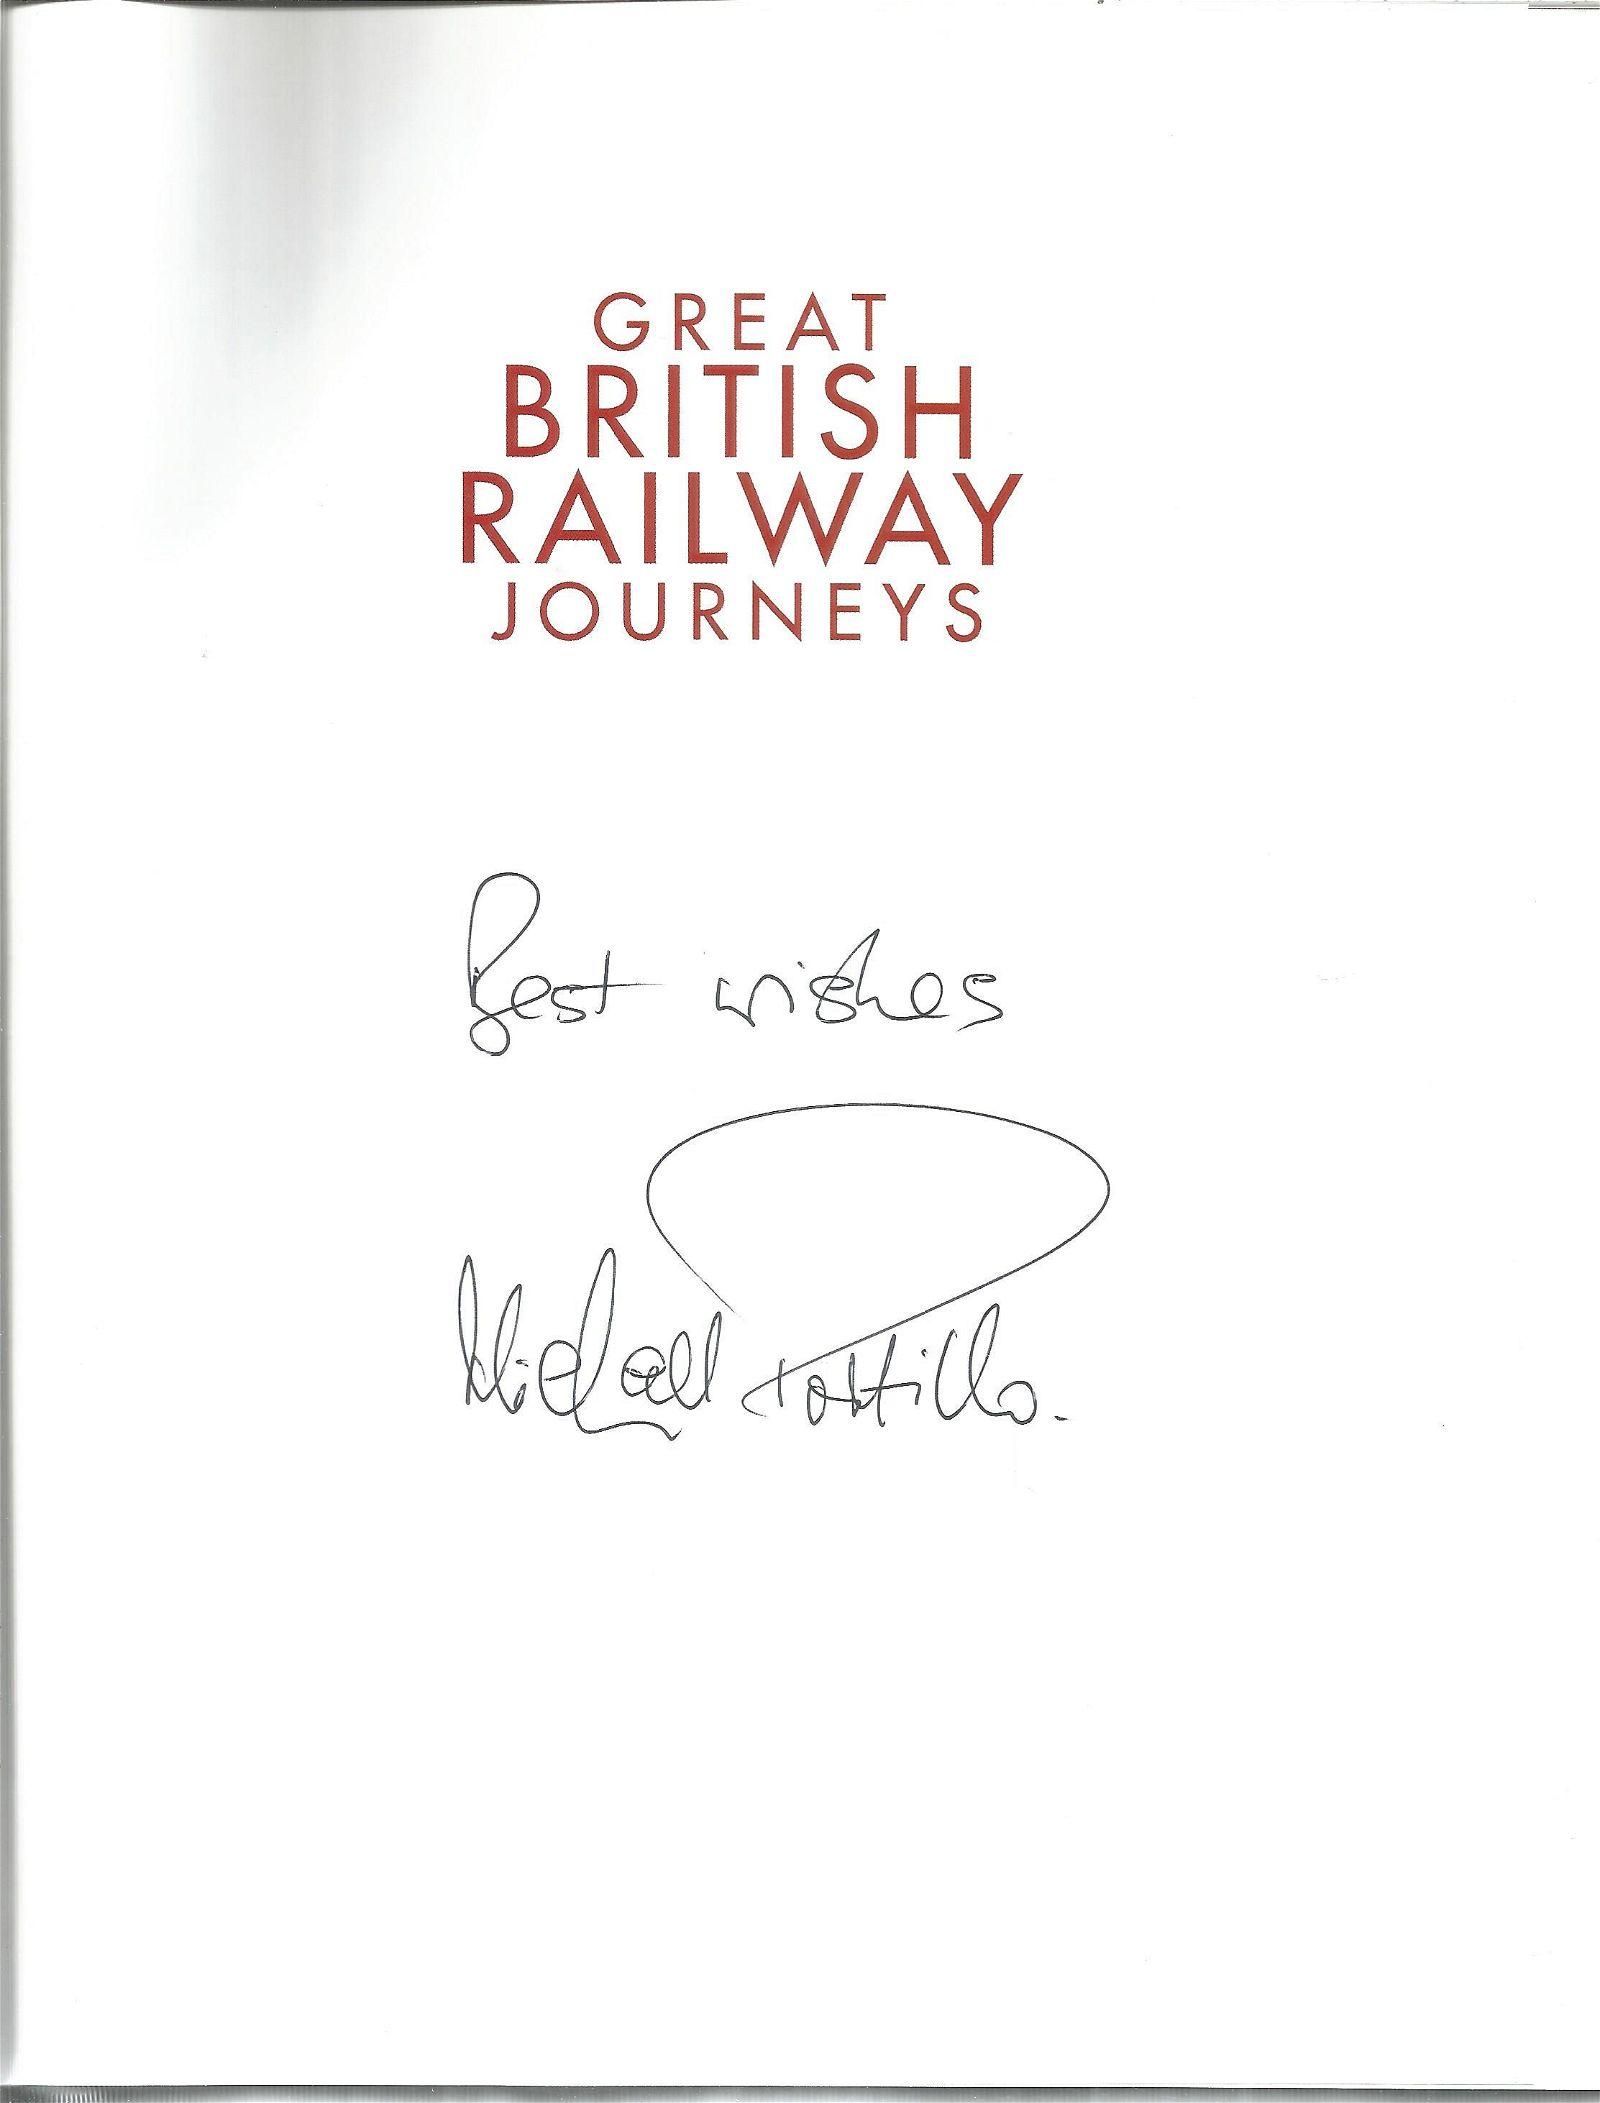 Michael Portillo signed Great British Railway Journeys